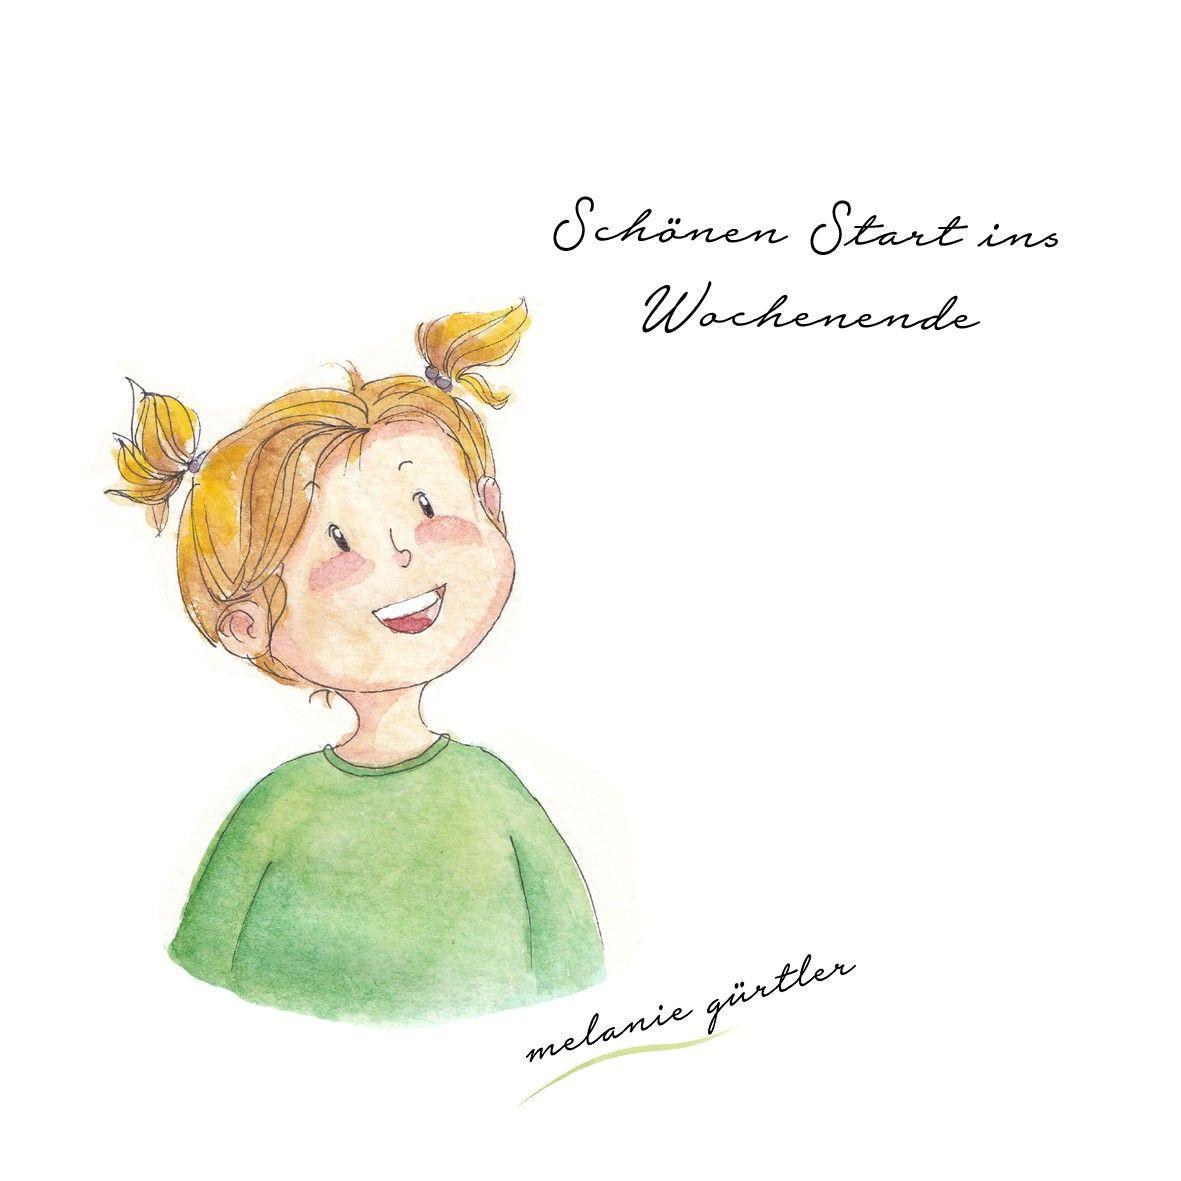 Kinderbuch Aquarell Melanie Gurtler Illustration